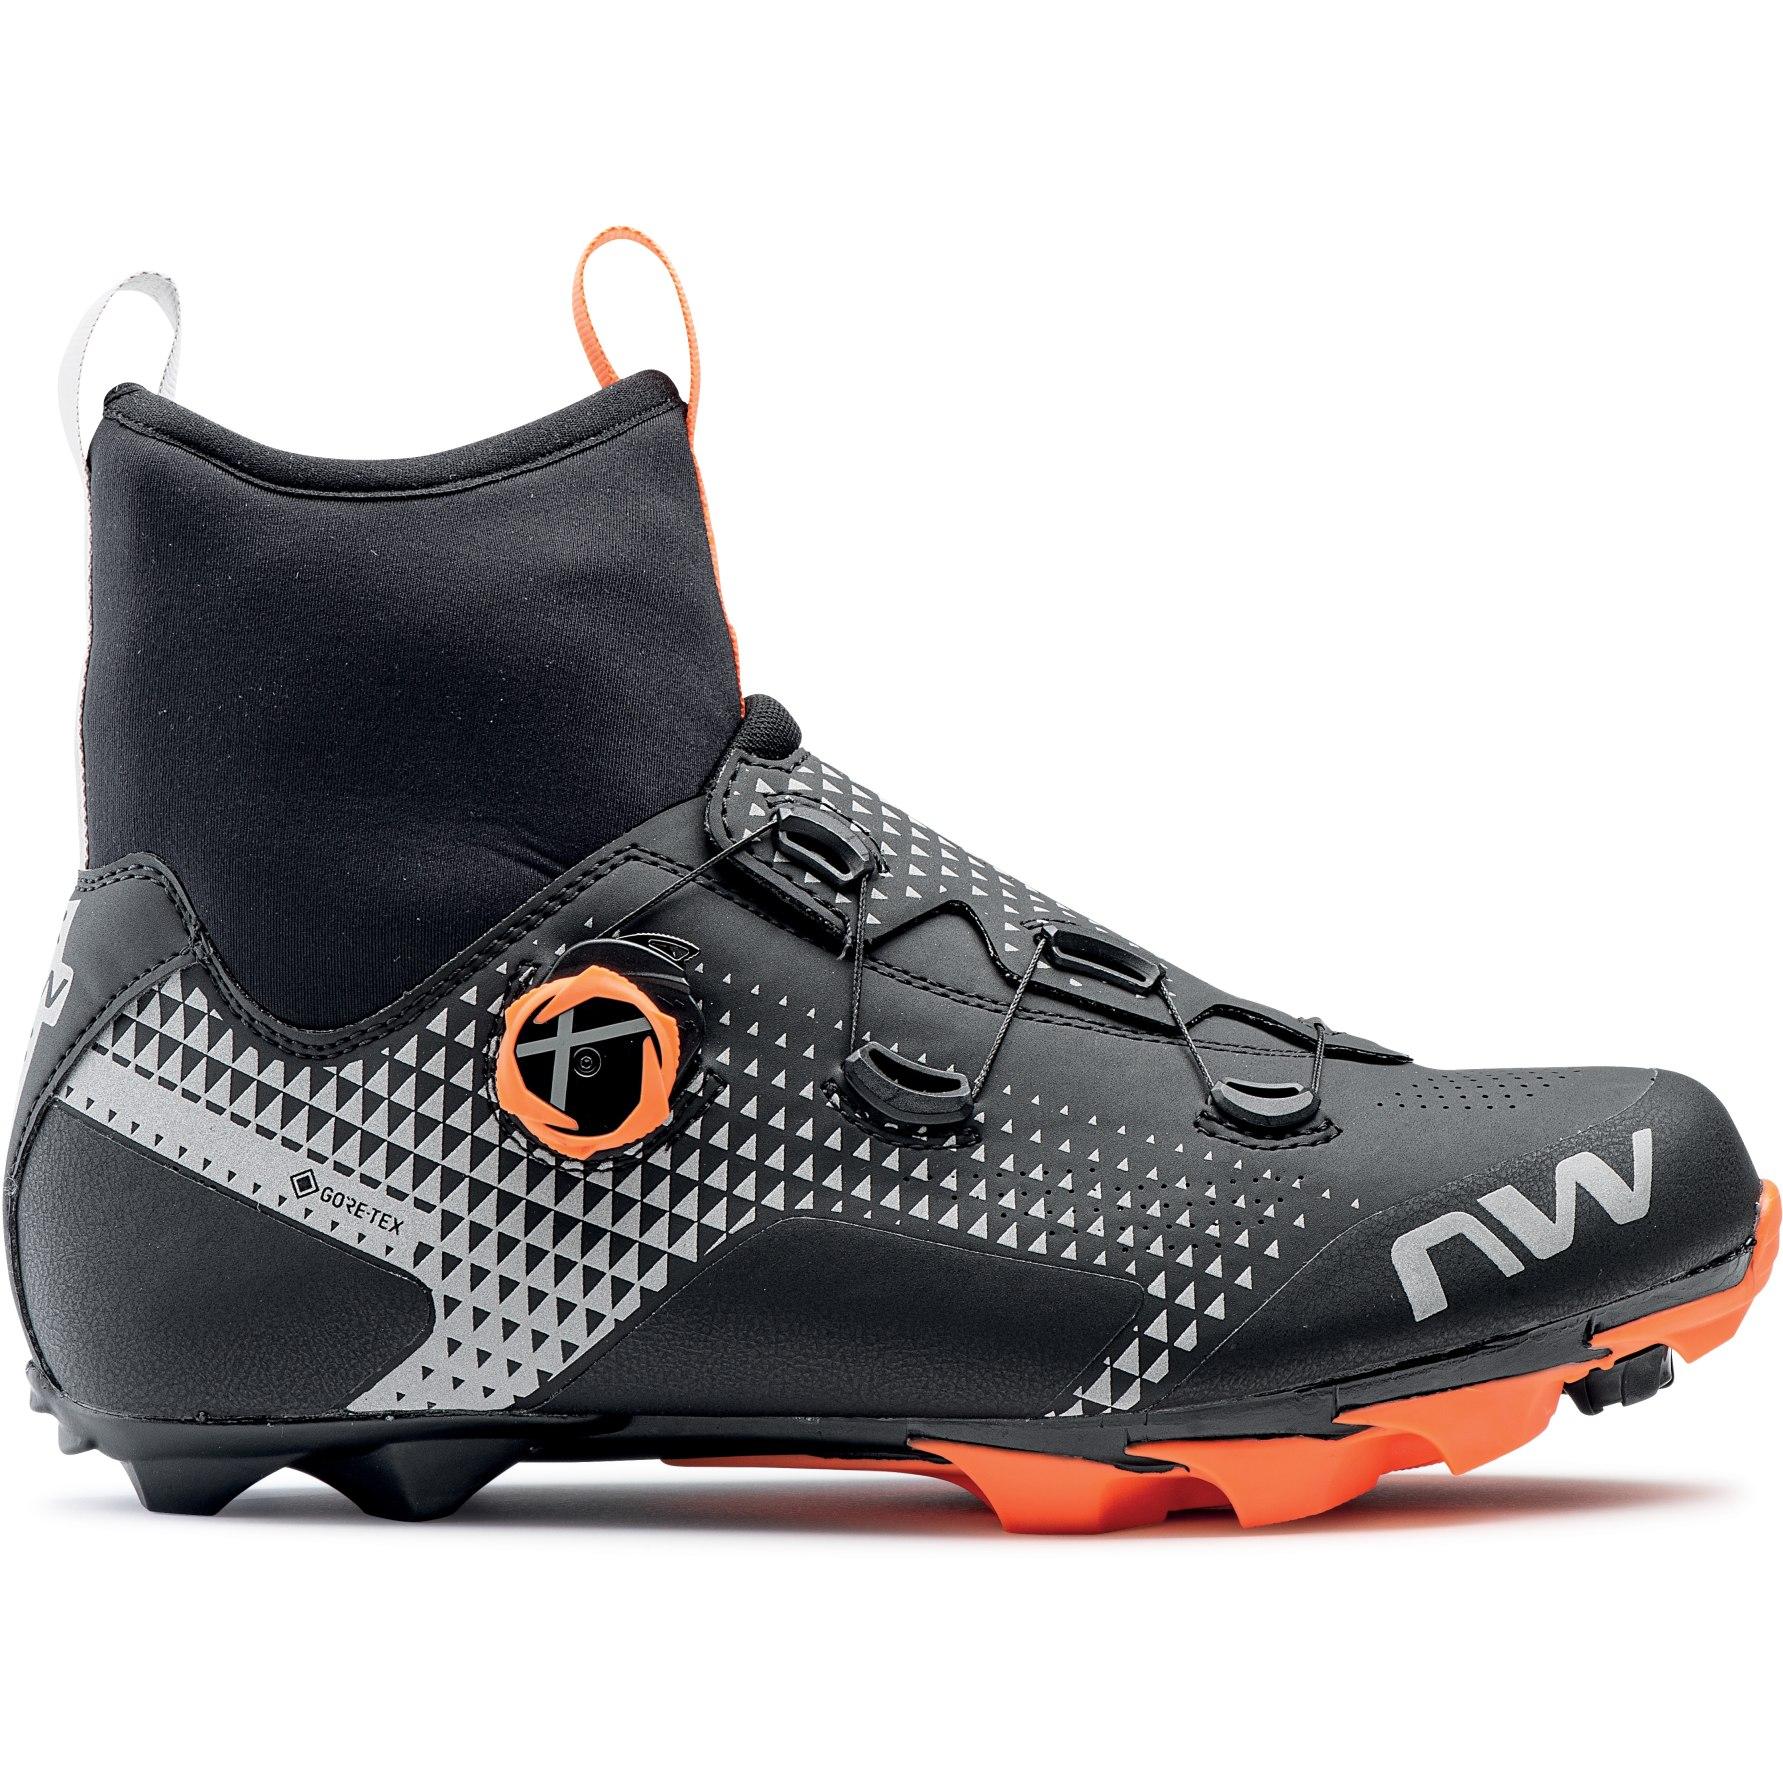 Northwave Celsius XC GTX MTB Schuhe - black/orange/reflective